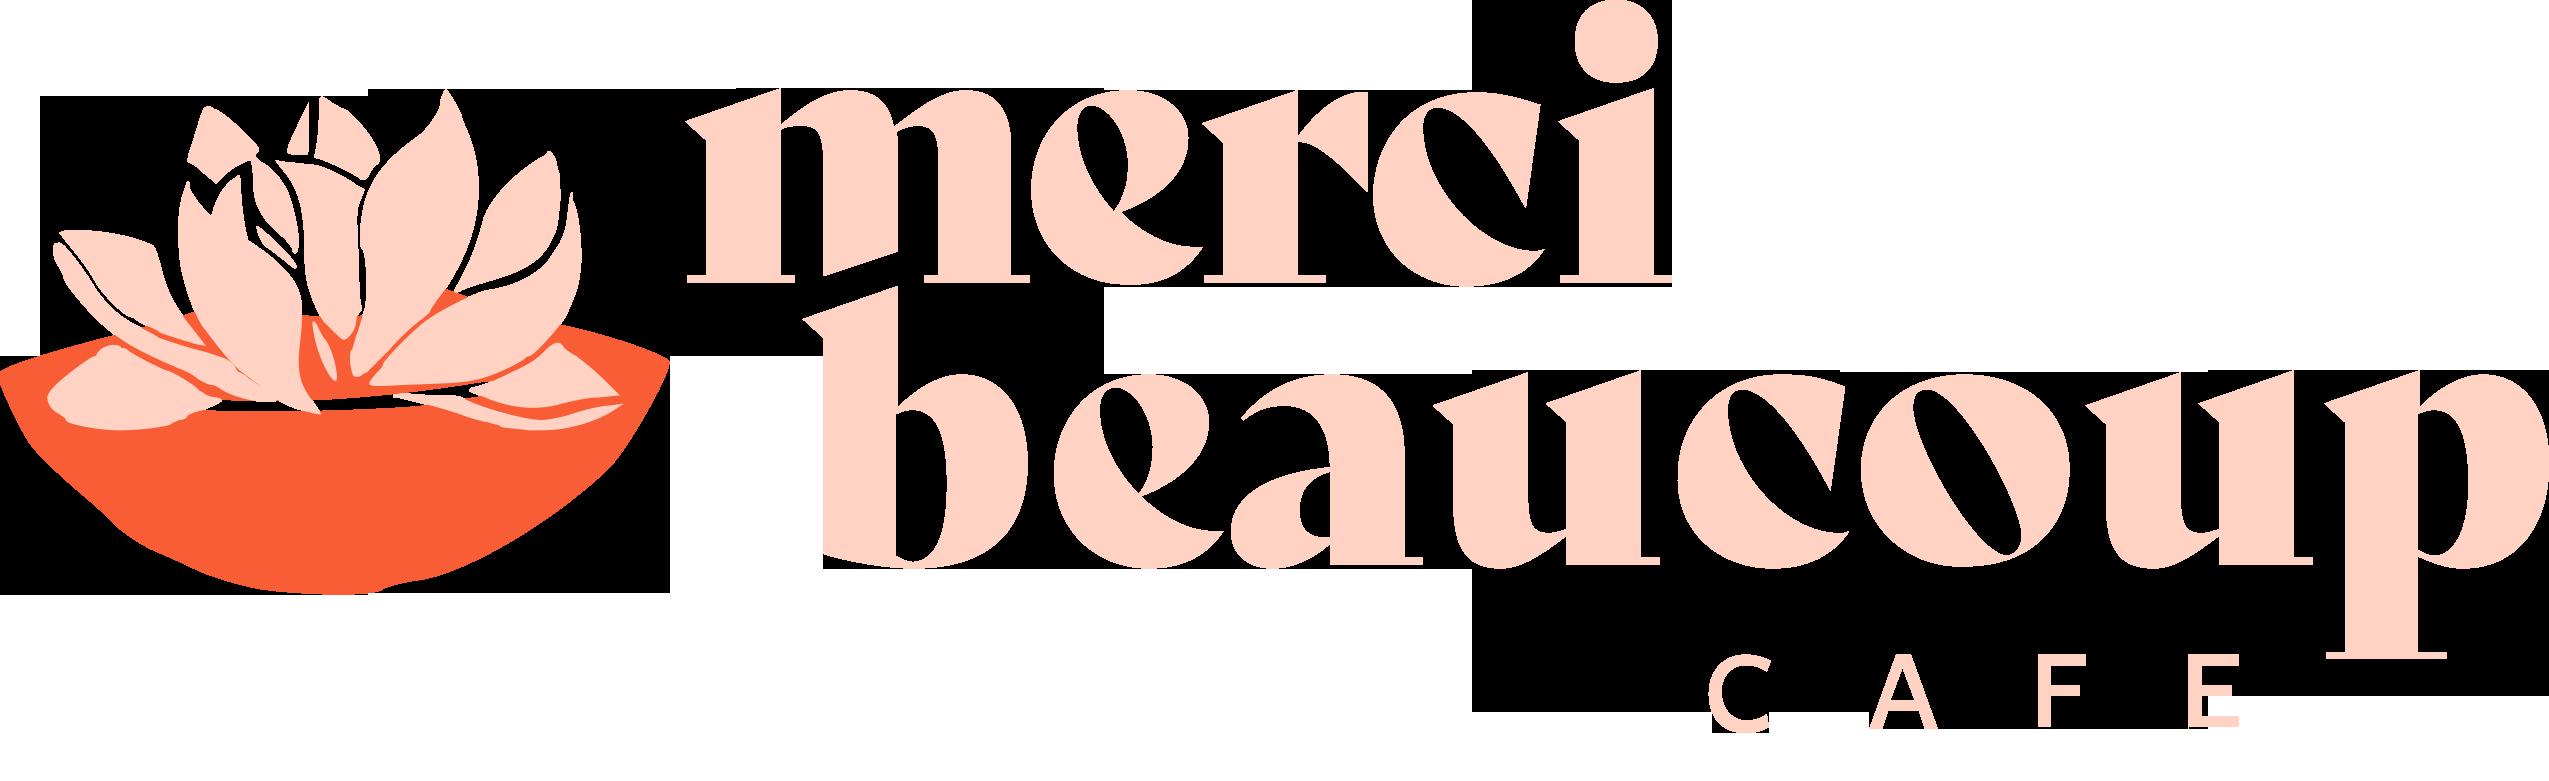 Merci Beaucoup Cafe